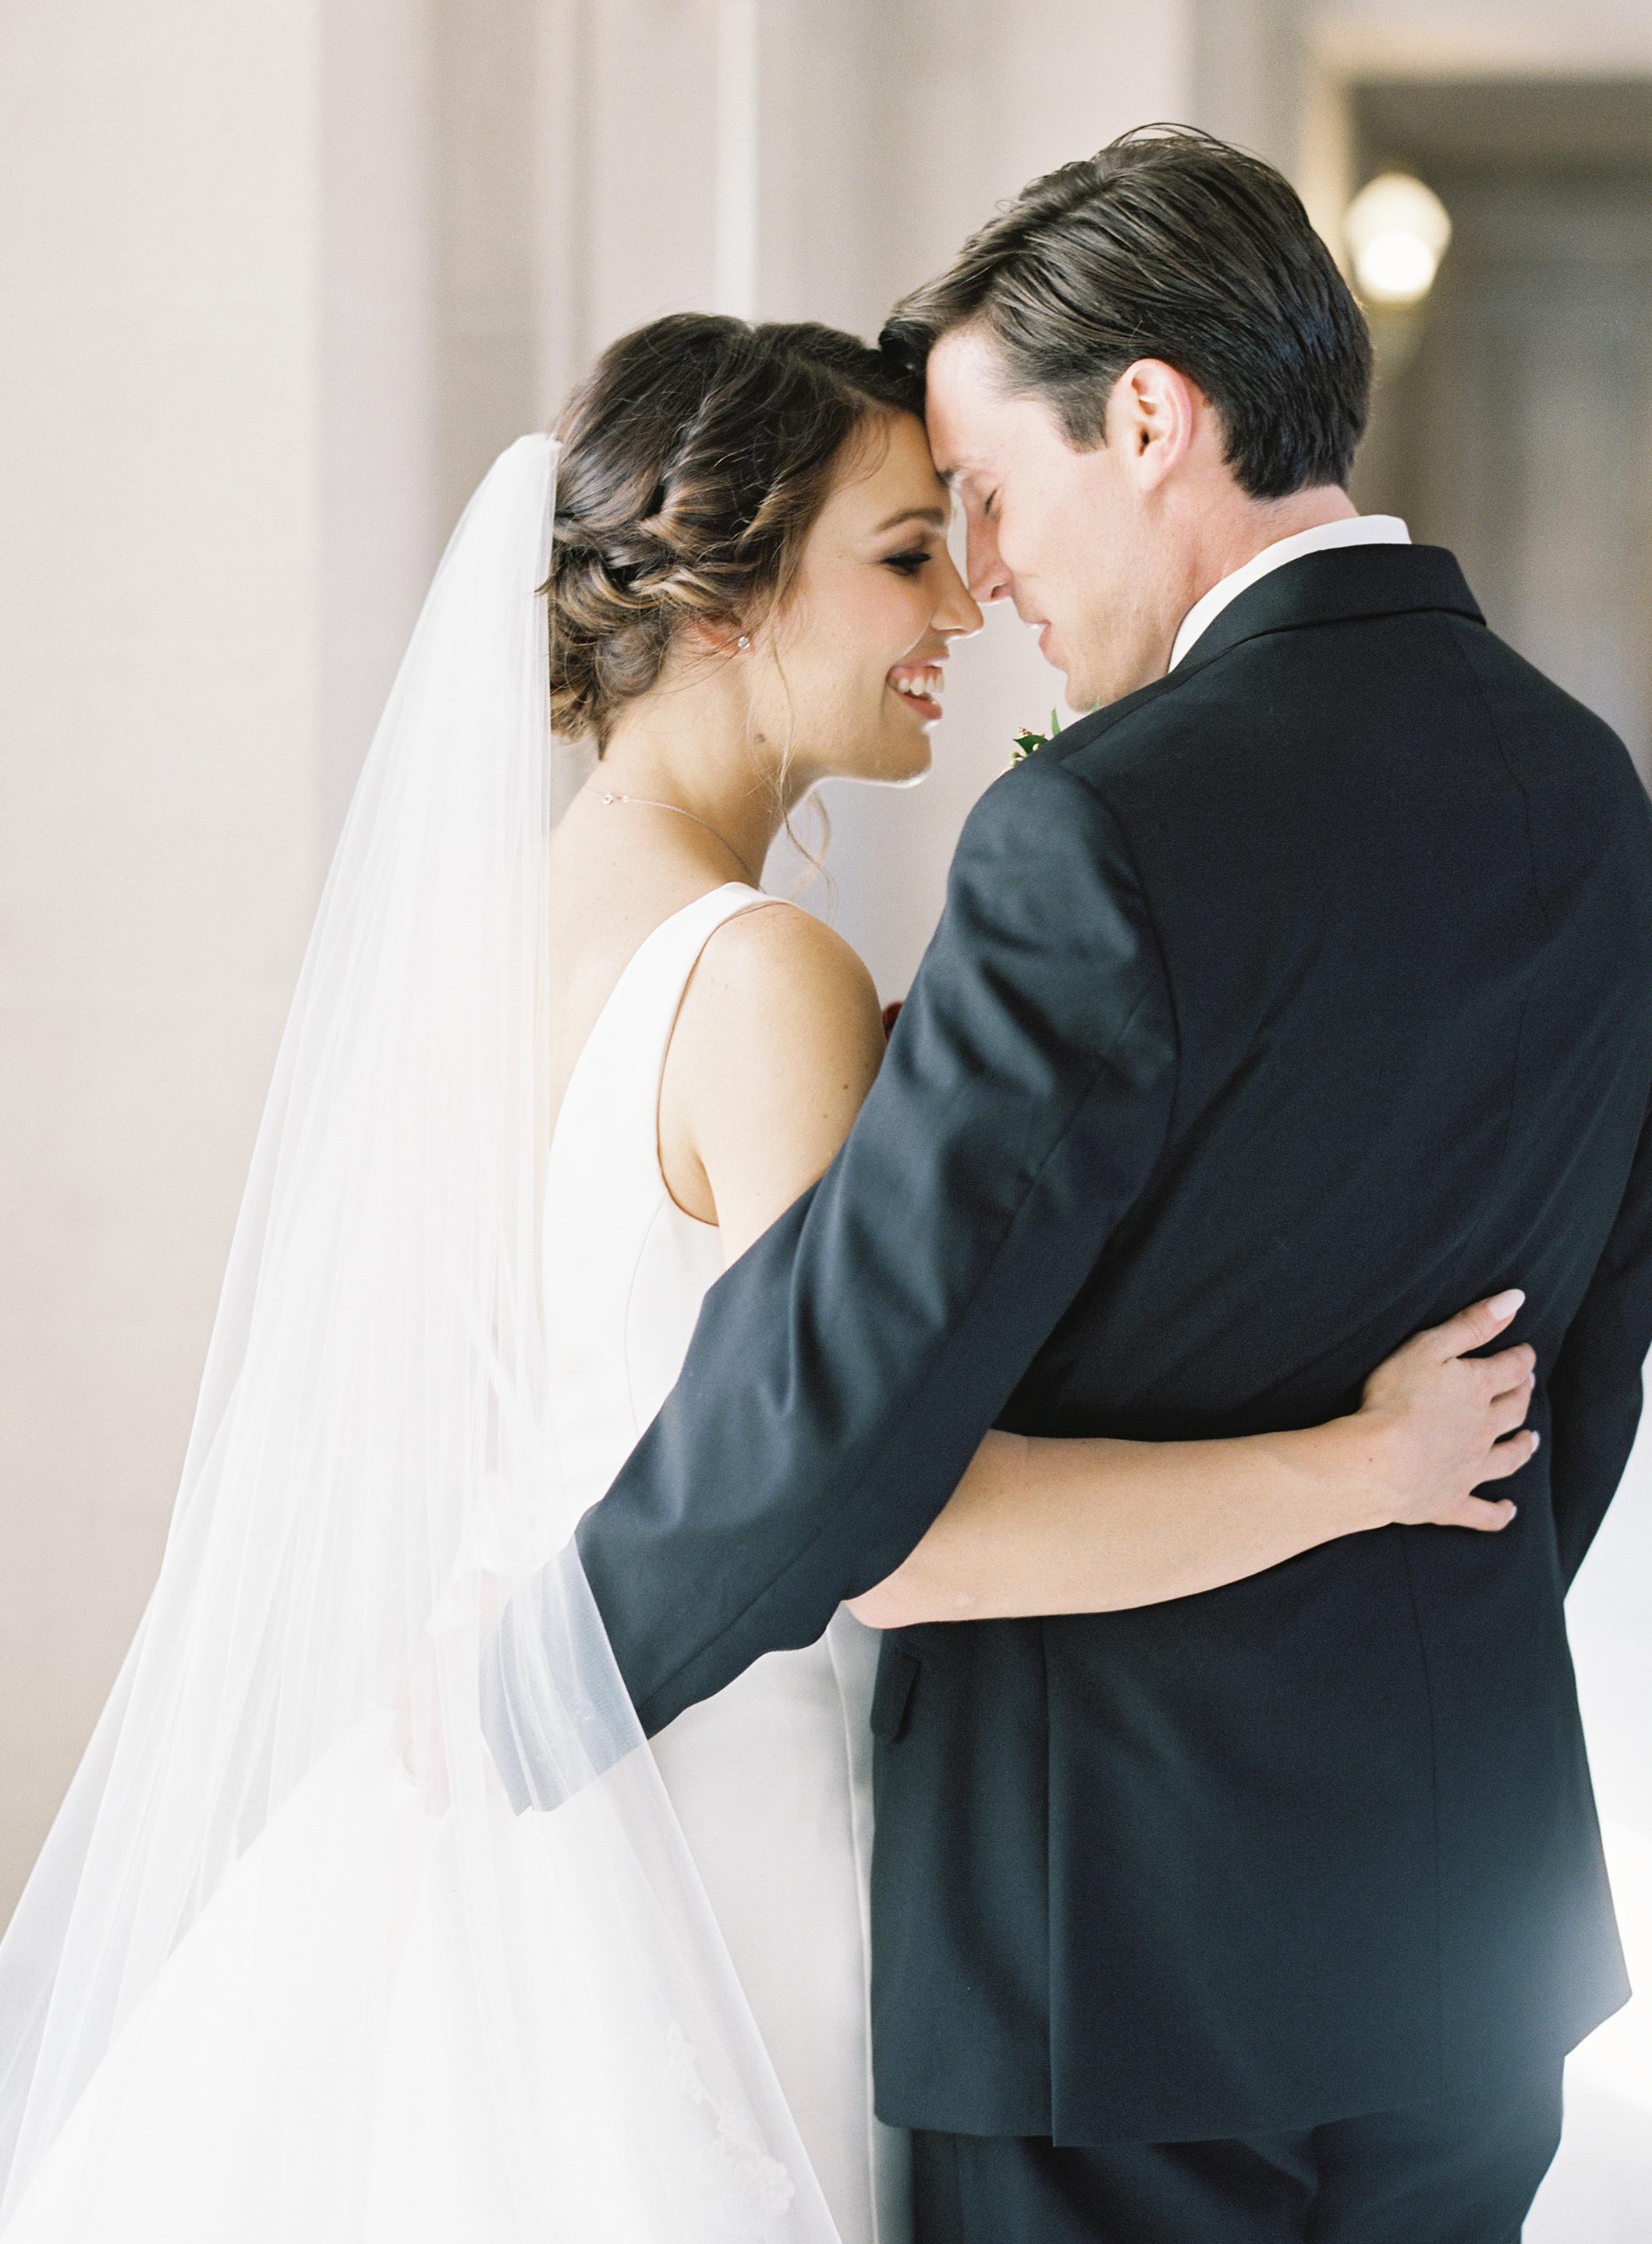 Meghan Mehan Photography - California Wedding Photographer | San Francisco City Hall Wedding 017.jpg